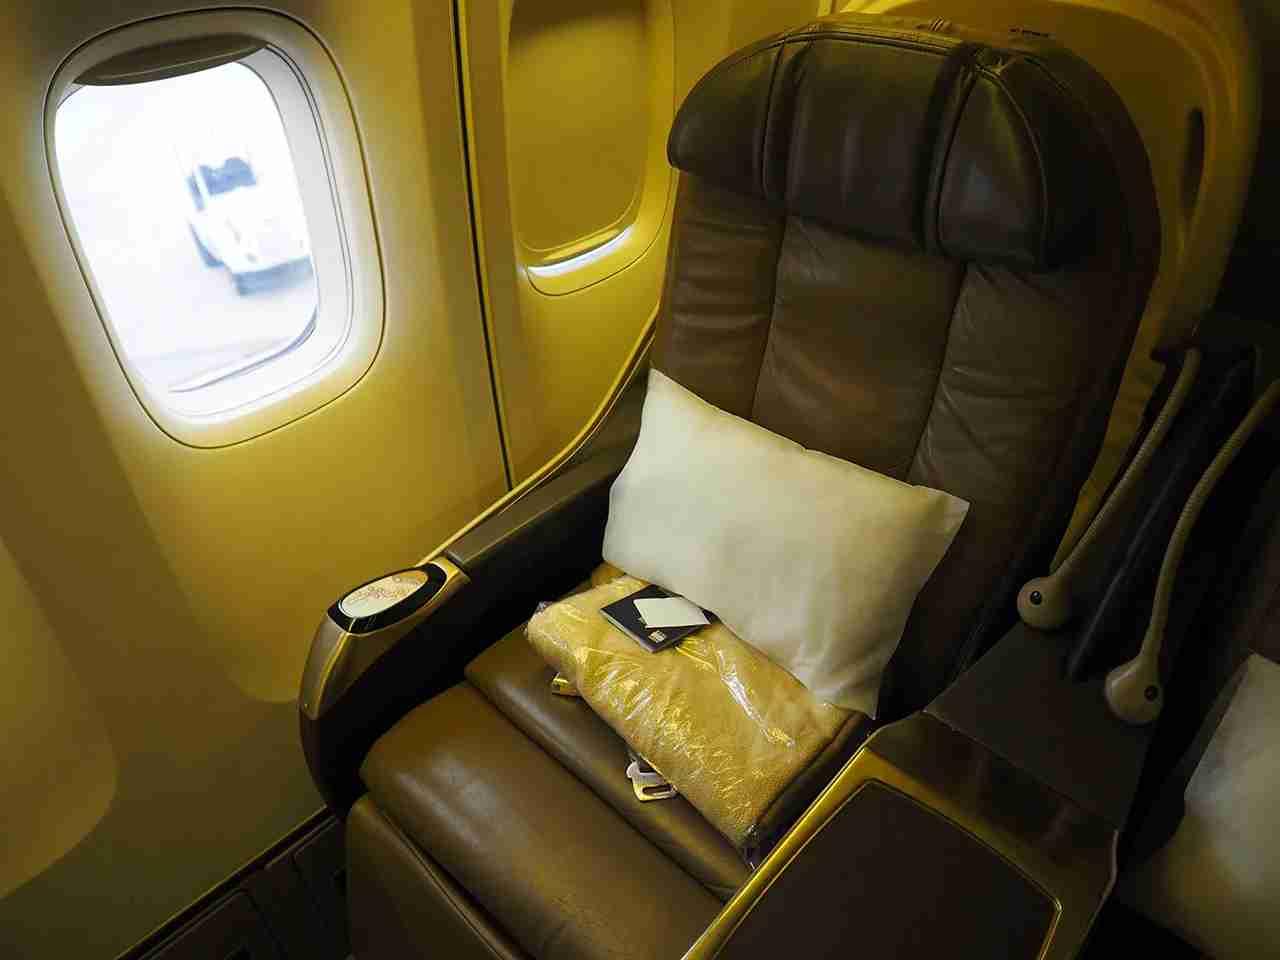 40K, a standard premium economy seat, located in the very last row of premium economy.